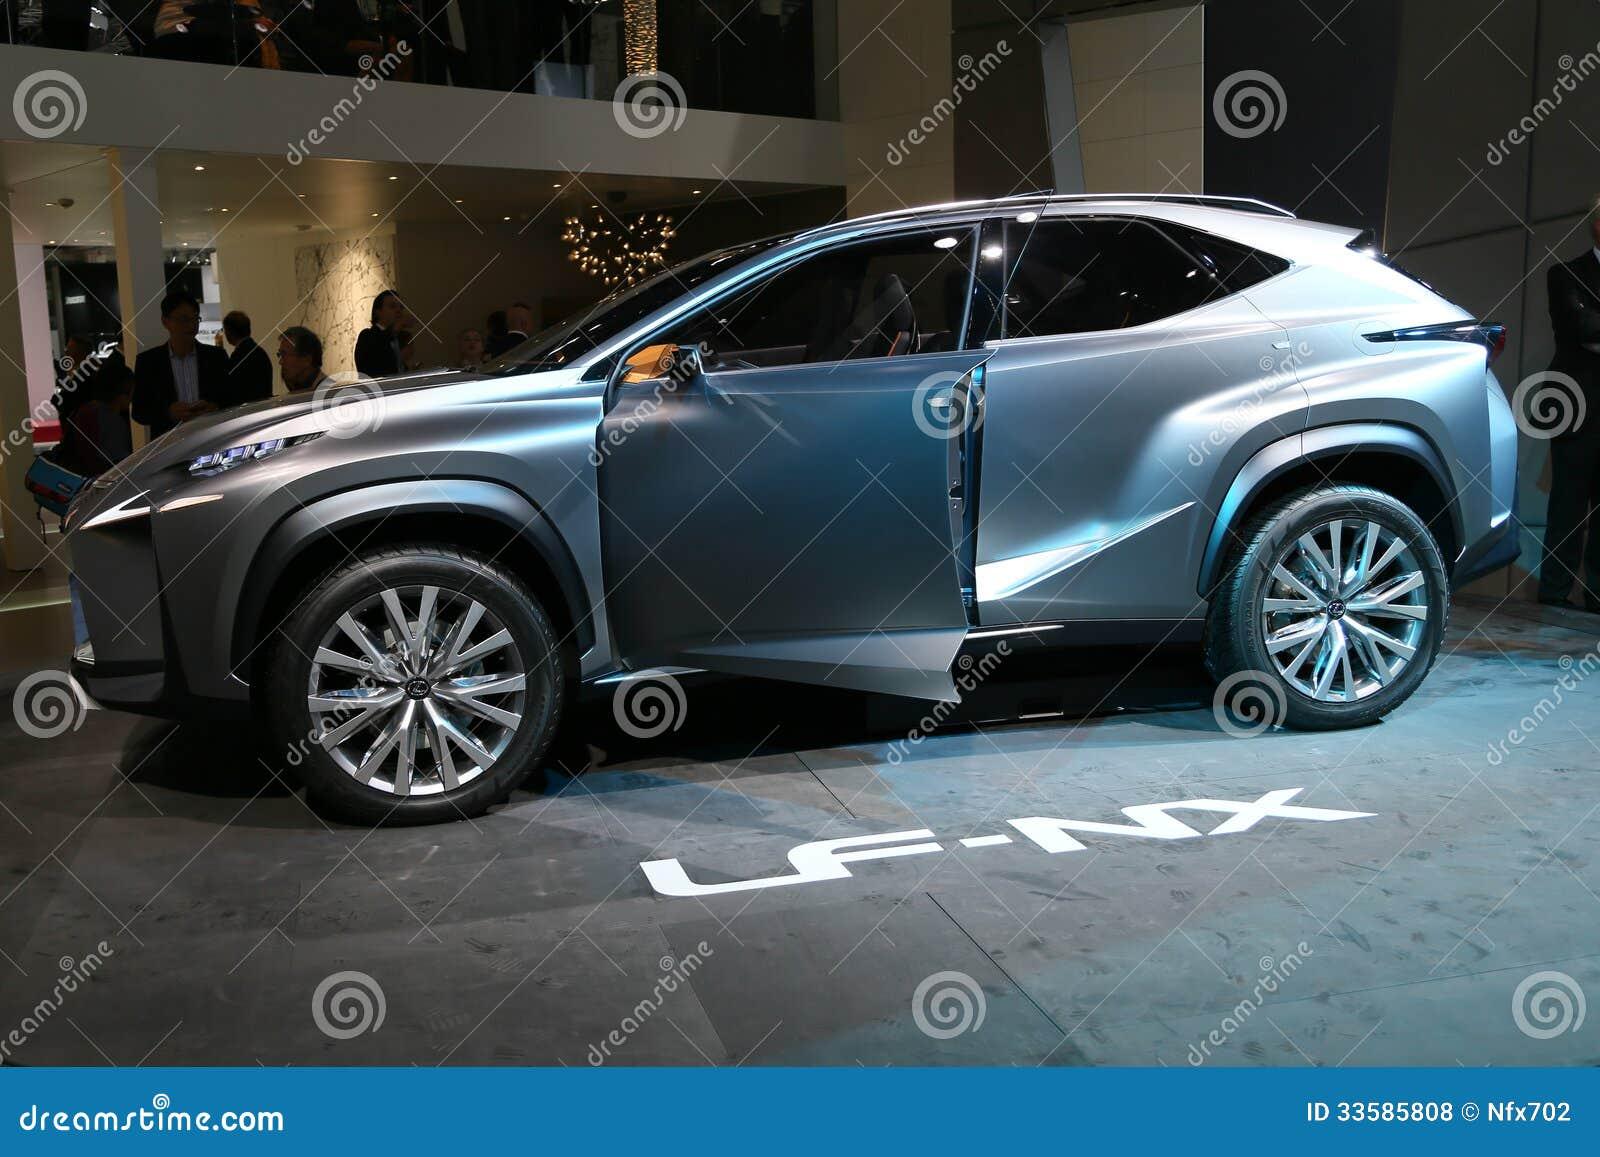 Lexus Lf Nx >> Suv Lexus Lf Nx Concept Editorial Stock Photo Image Of Nx 33585808